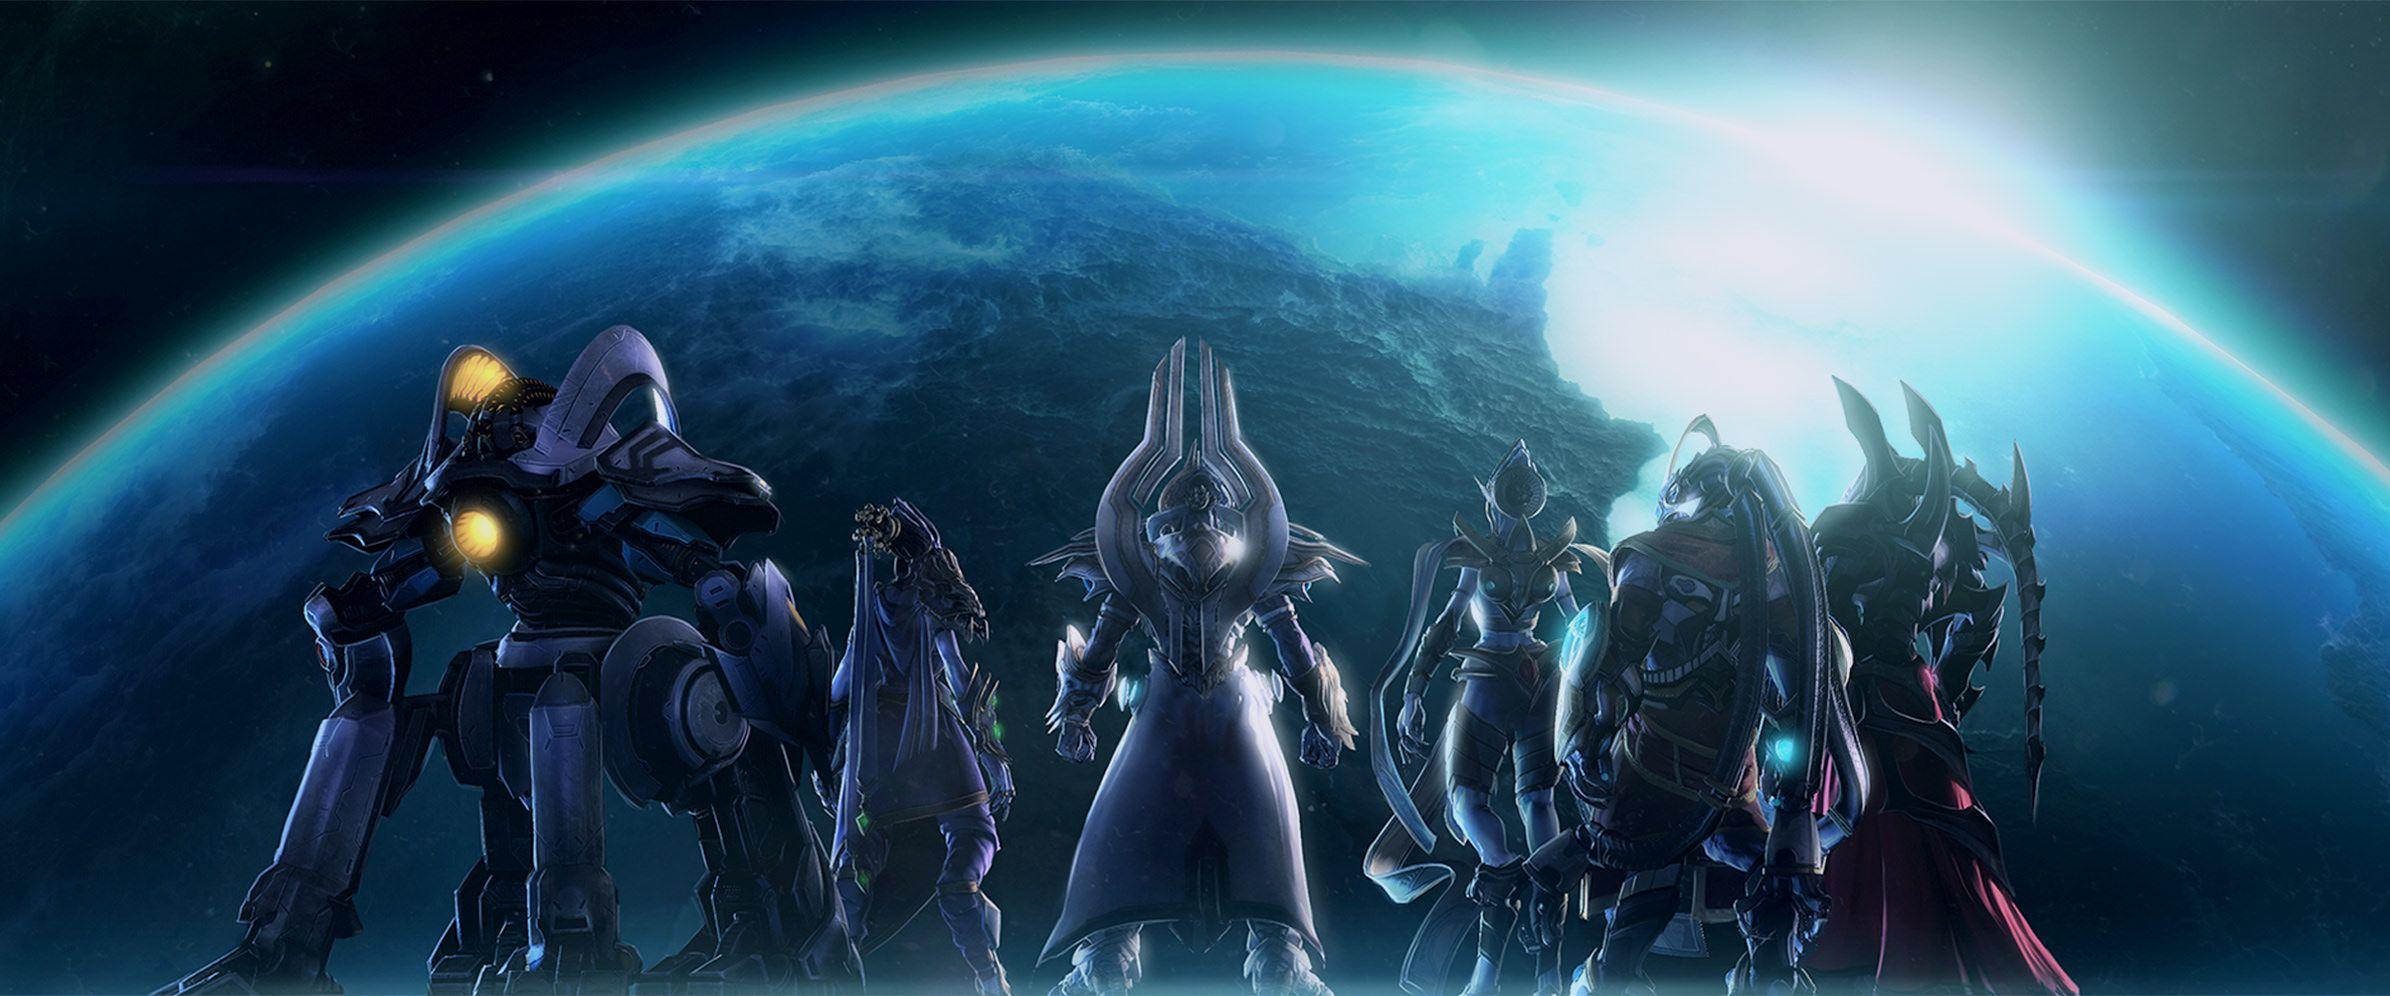 Starcraft 2 Templar's Return #games #Starcraft #Starcraft2